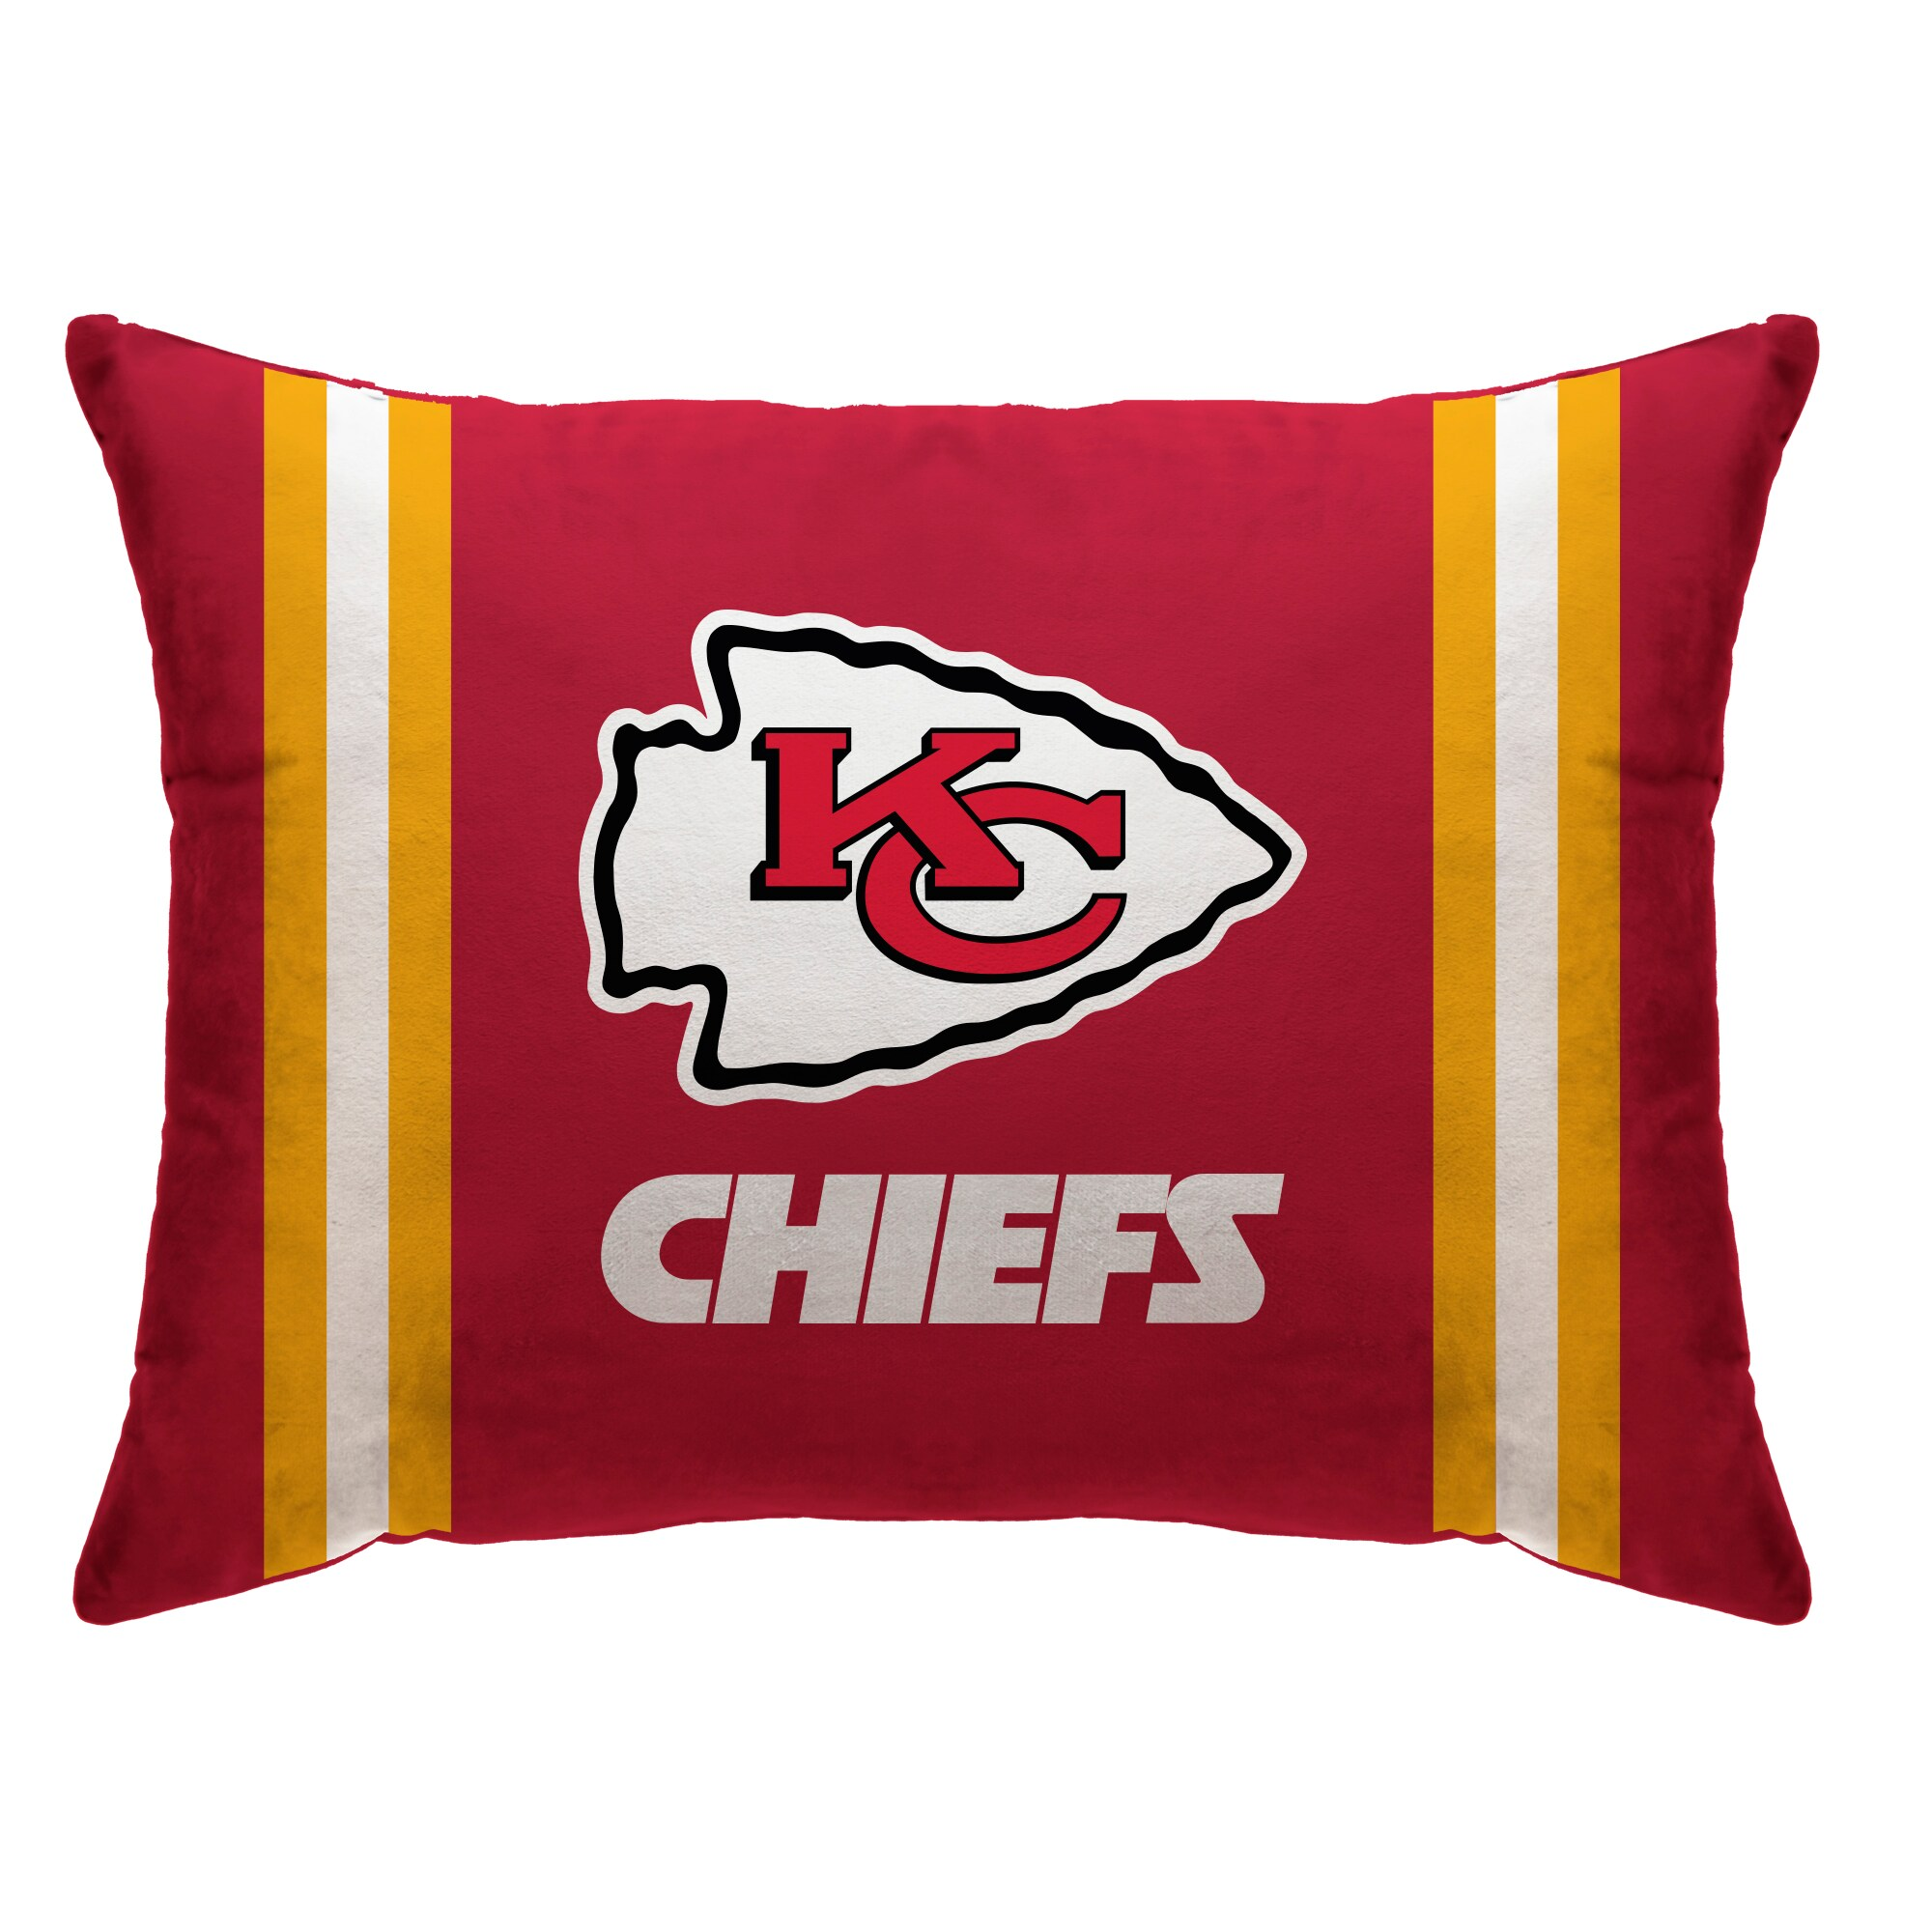 "Kansas City Chiefs 20"" x 26"" Plush Bed Pillow - Red"